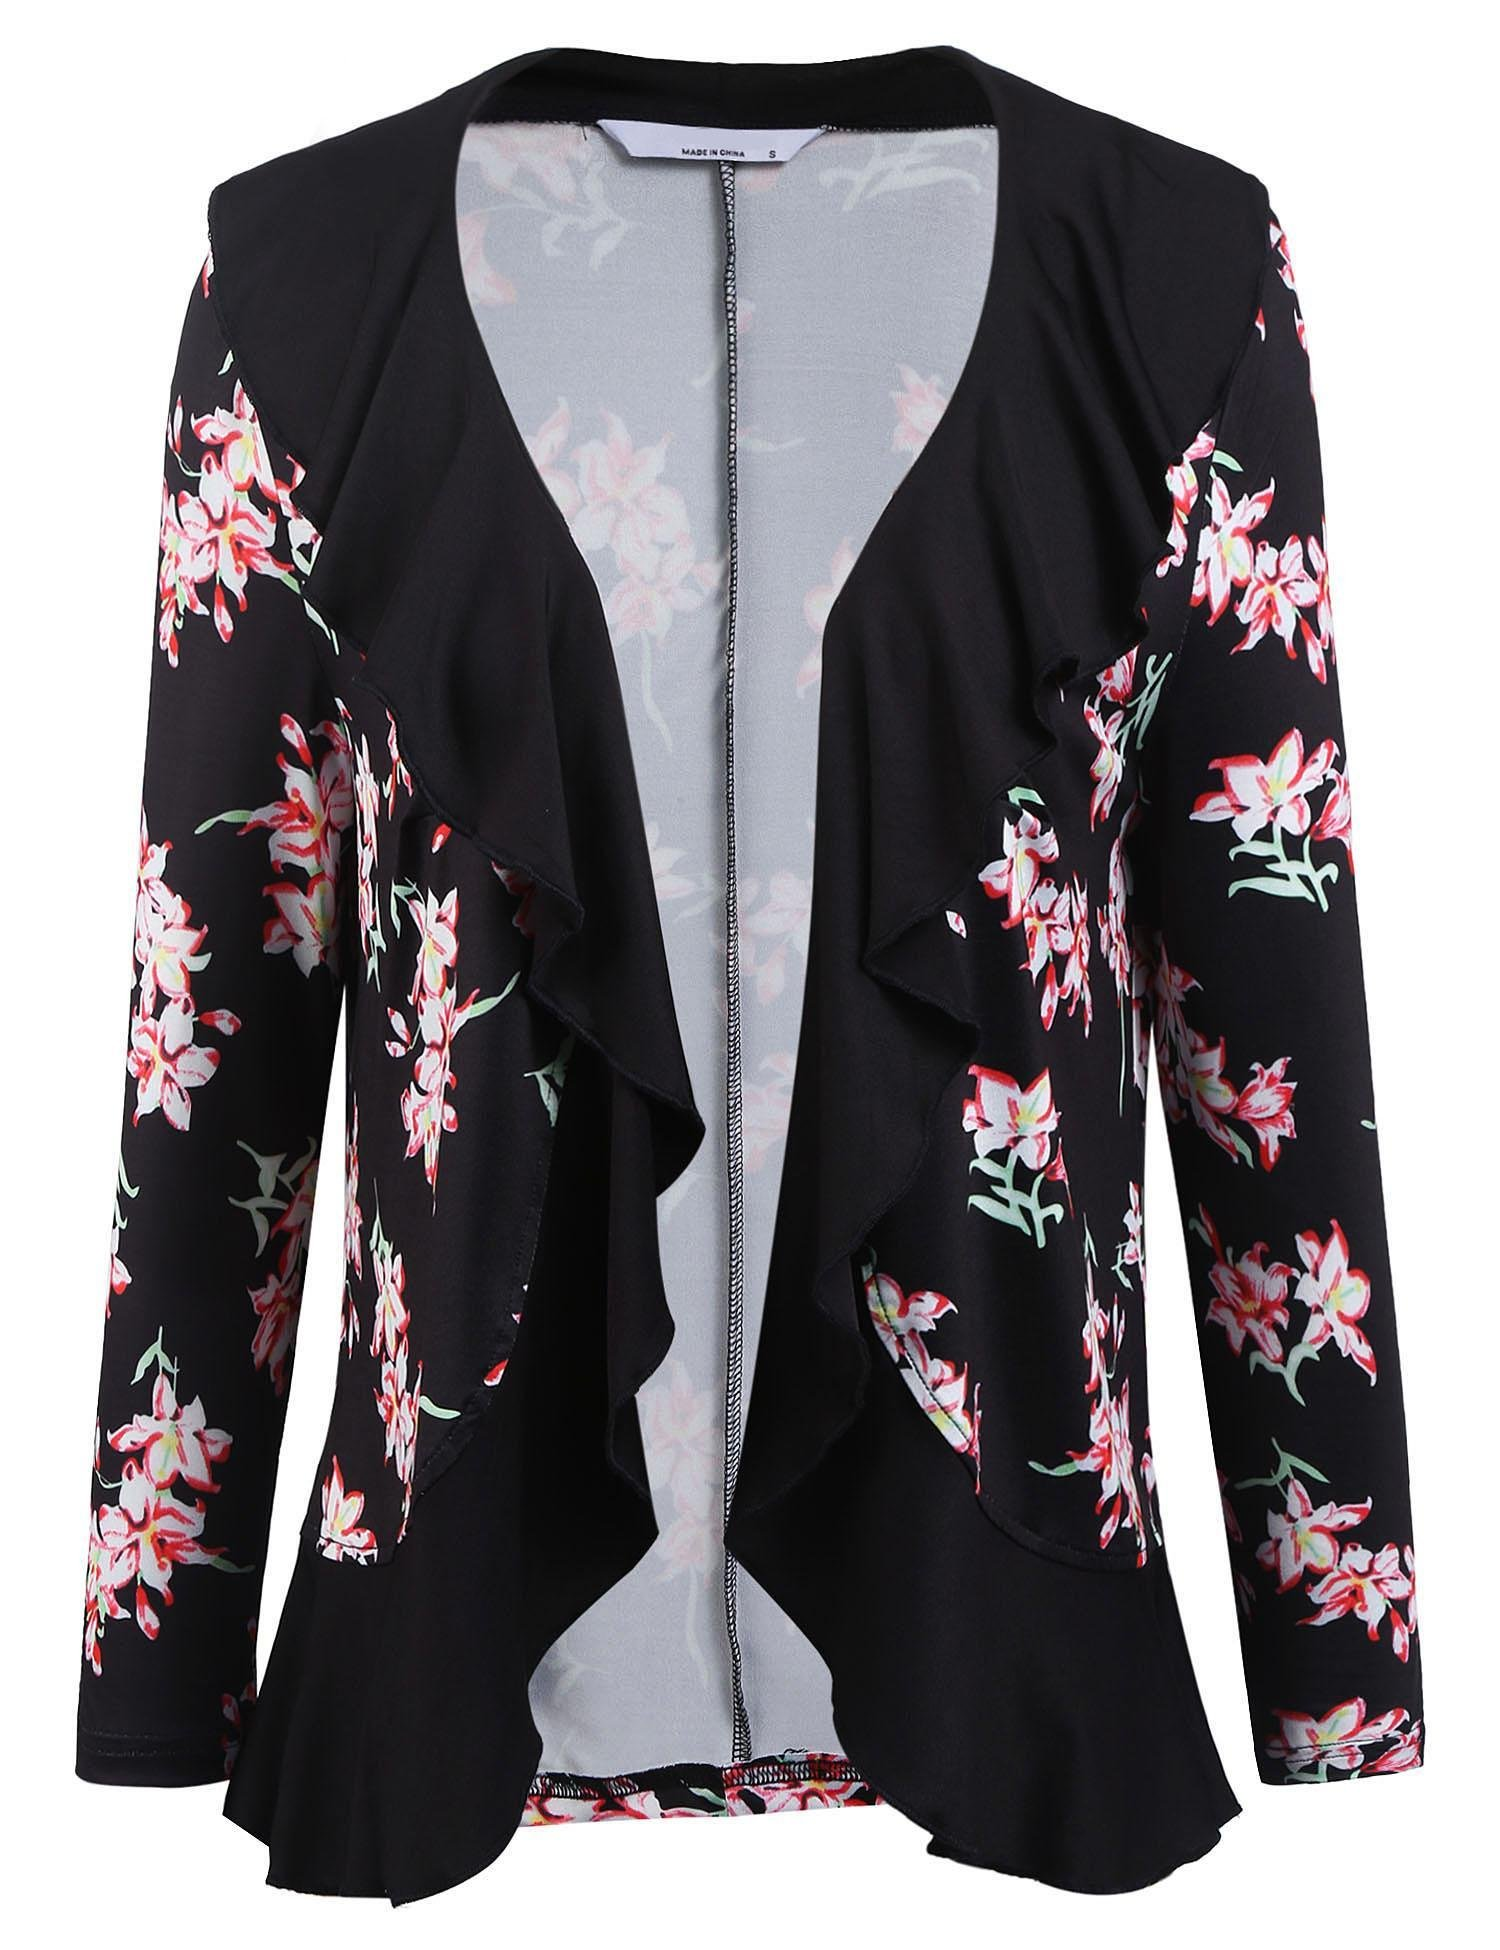 ELESOL Womens Fashion Floral Print Cardigan Long Tops Loose Ruffle Cover Coat Black1/S